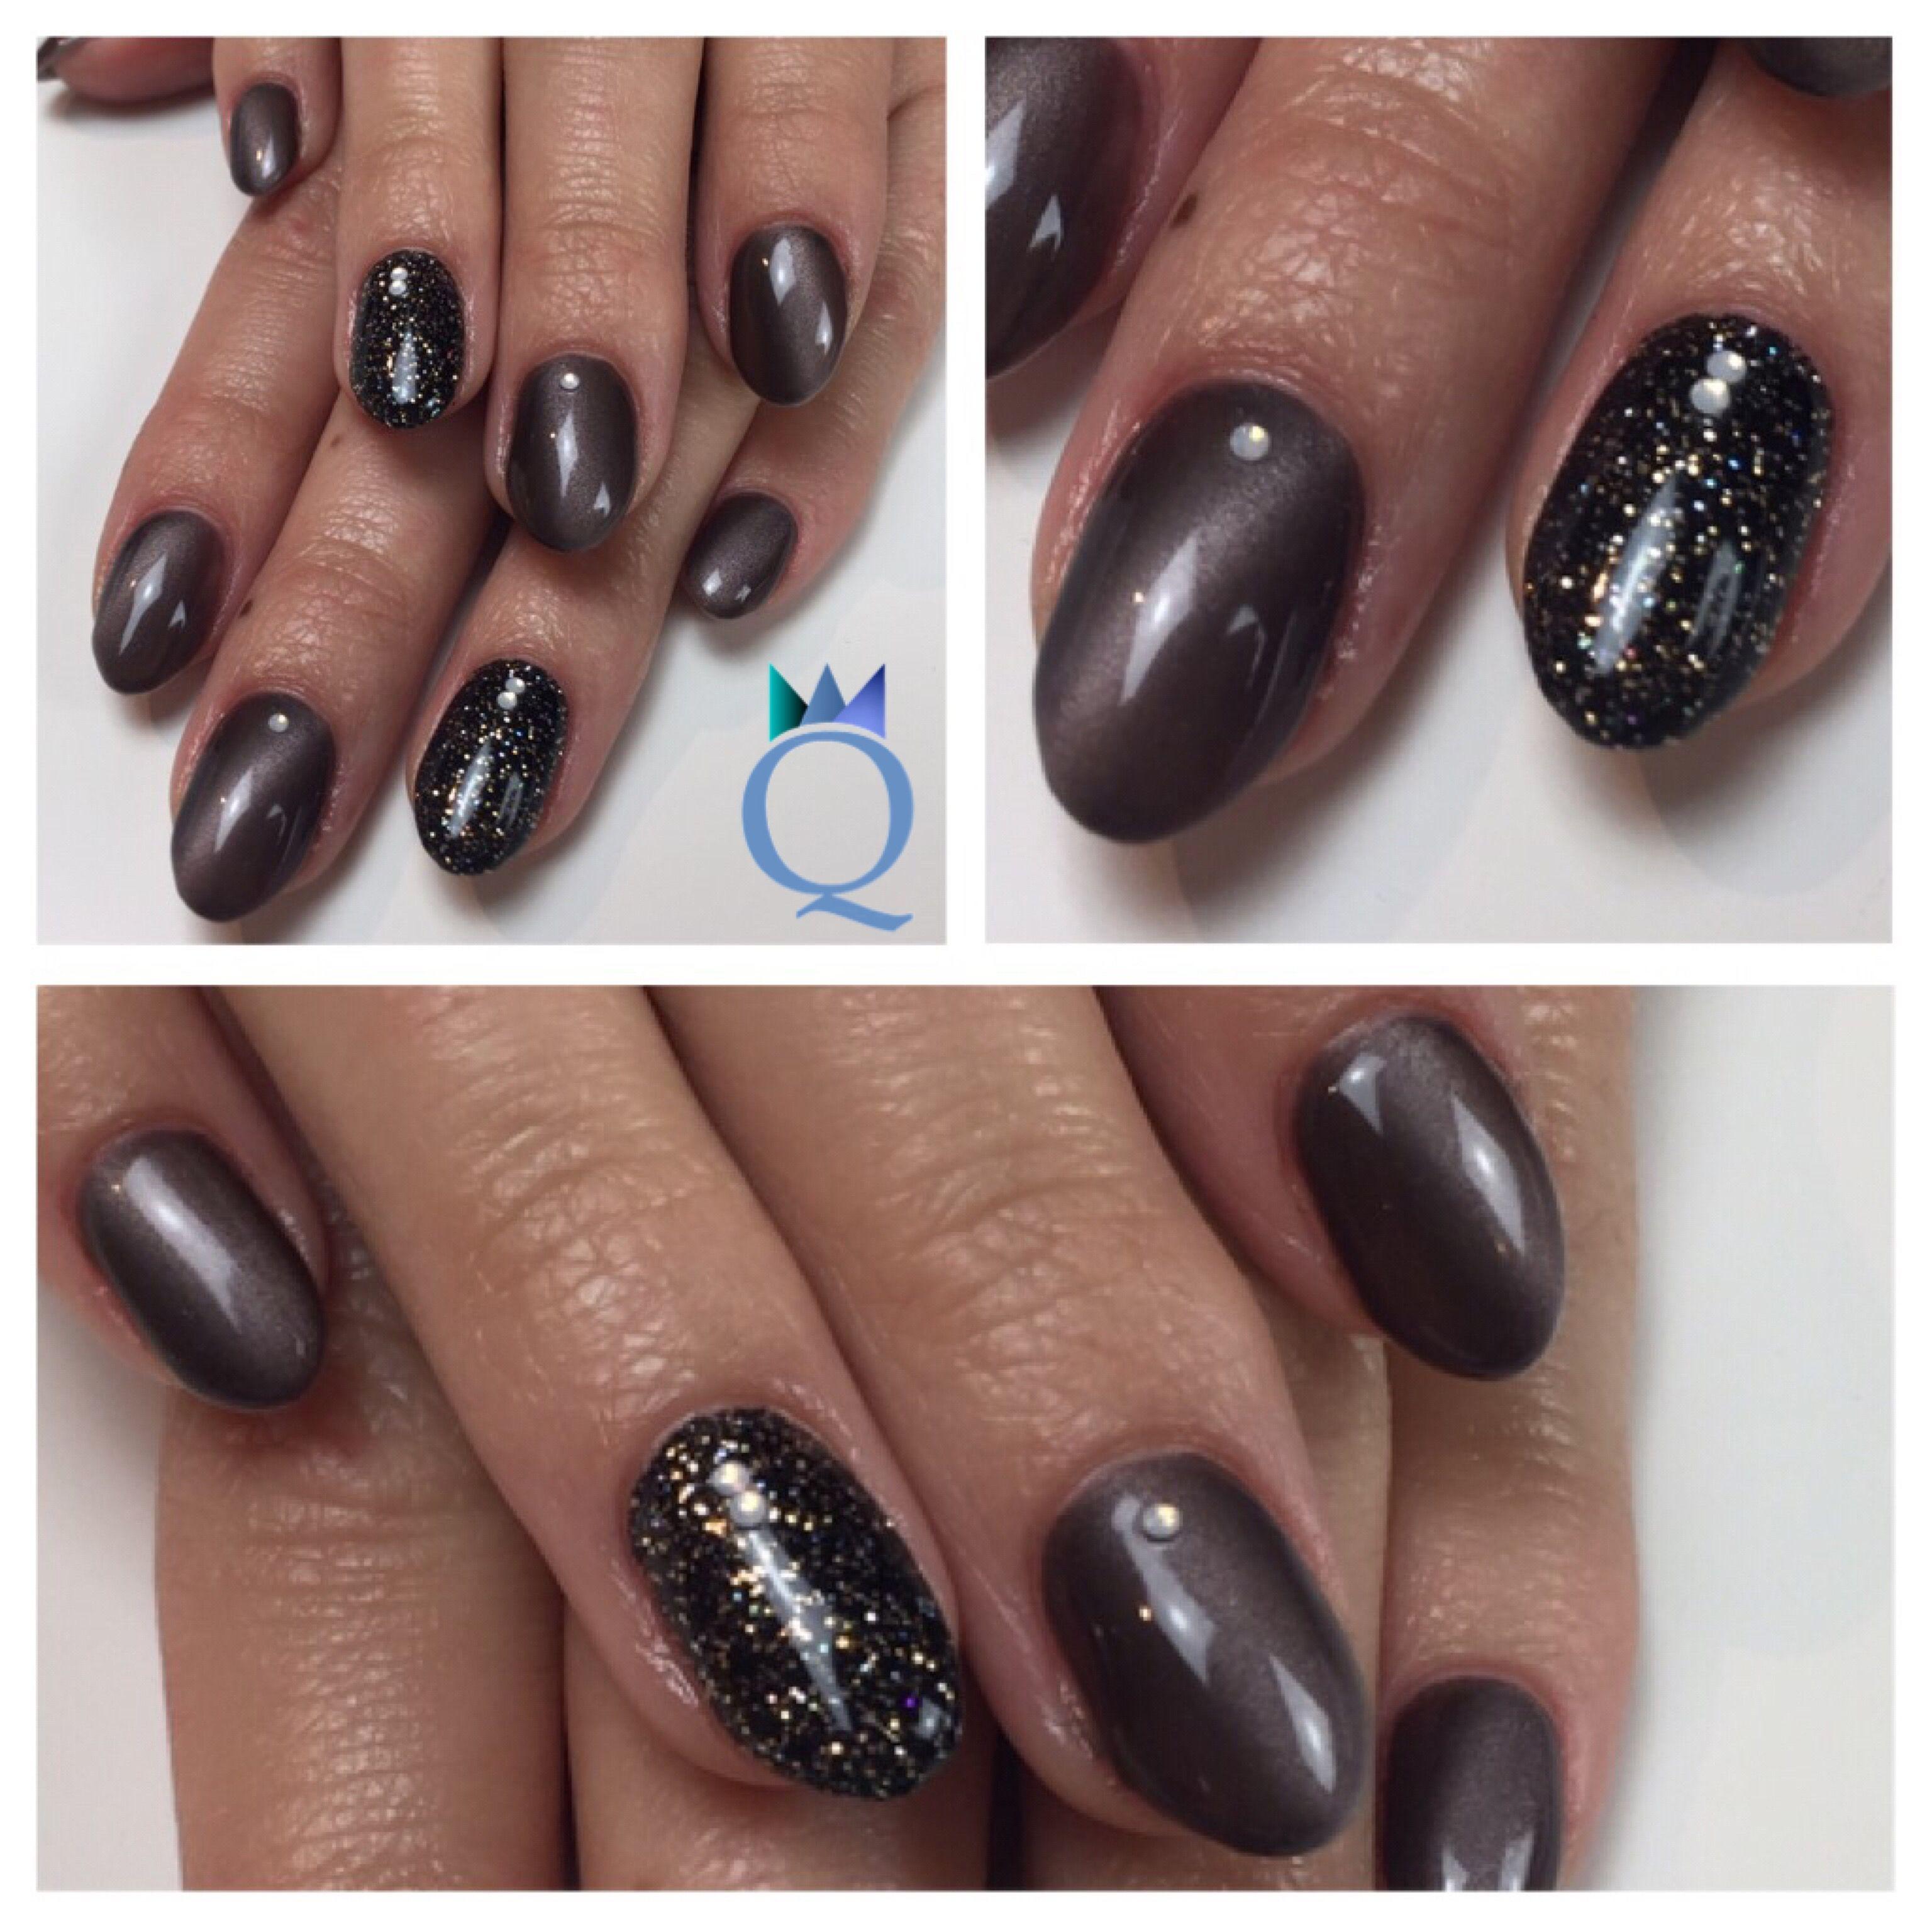 shortnails gelnails nails black glitter brown cateye akyado kurzen gel geln gel n gel. Black Bedroom Furniture Sets. Home Design Ideas